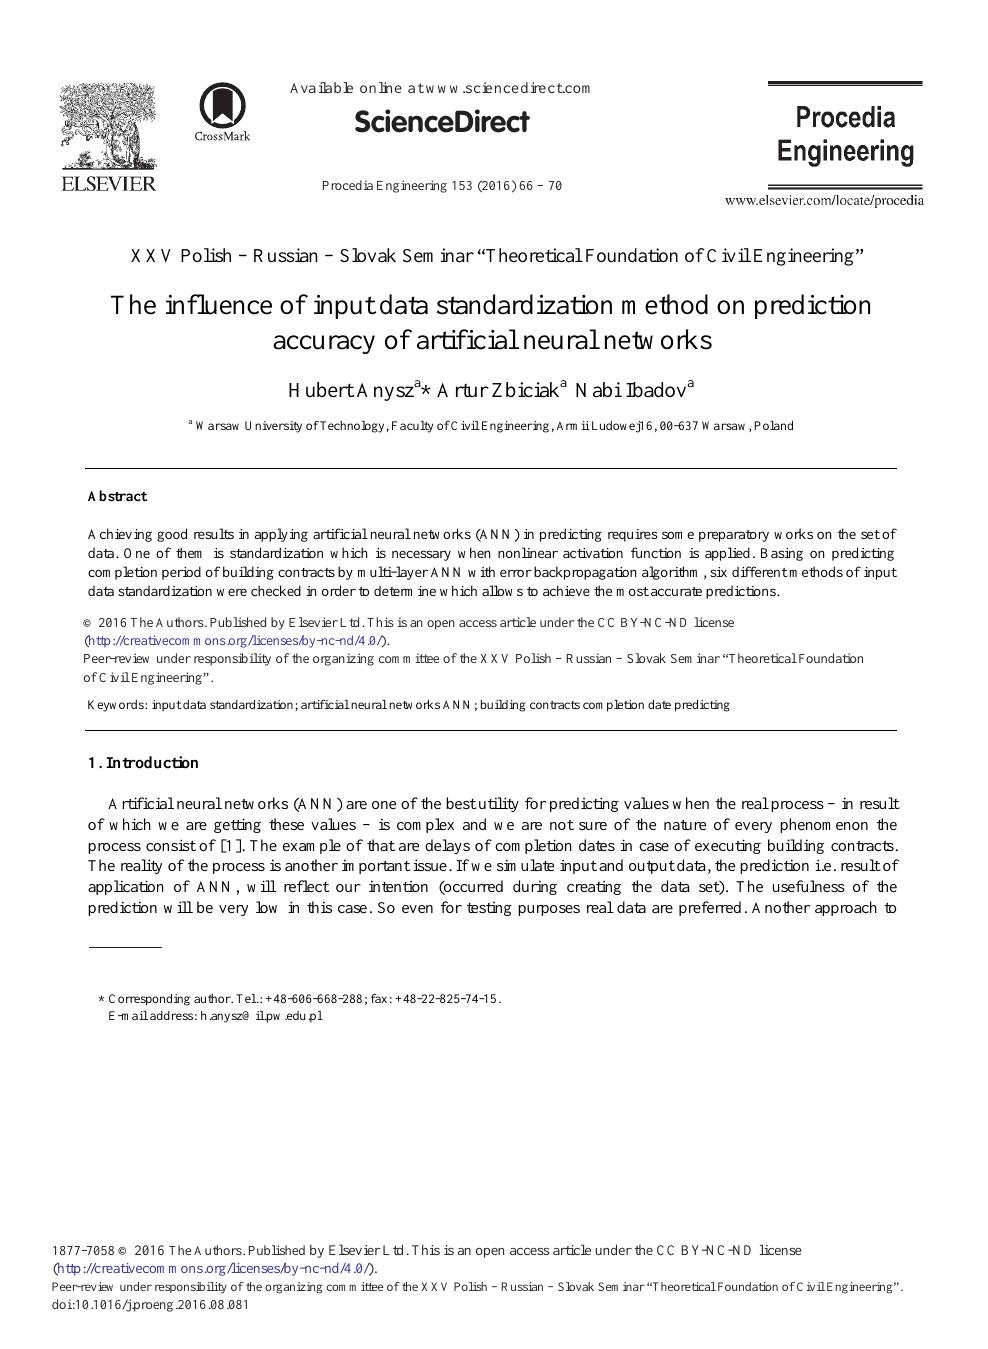 The Influence of Input Data Standardization Method on Prediction